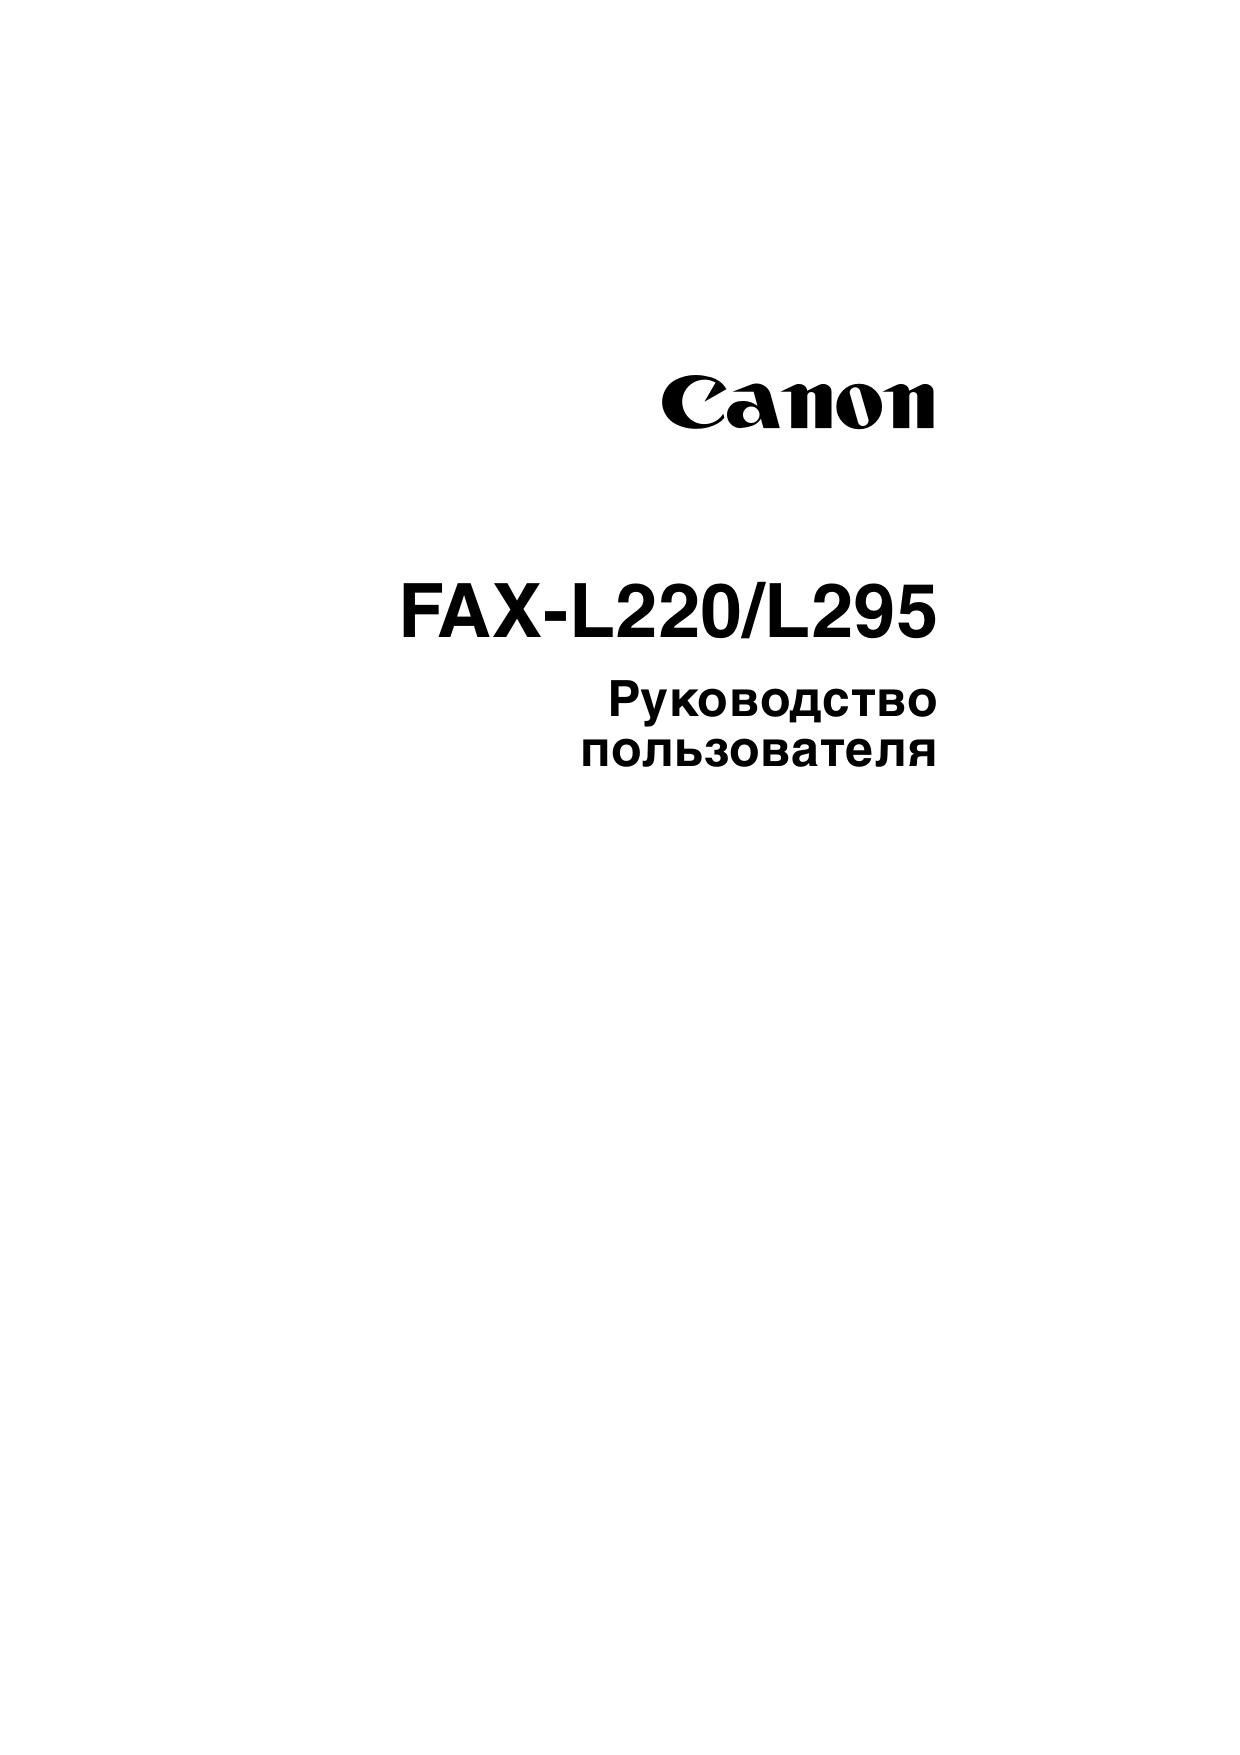 Canon Super G3 Faxphone L80 User Manual